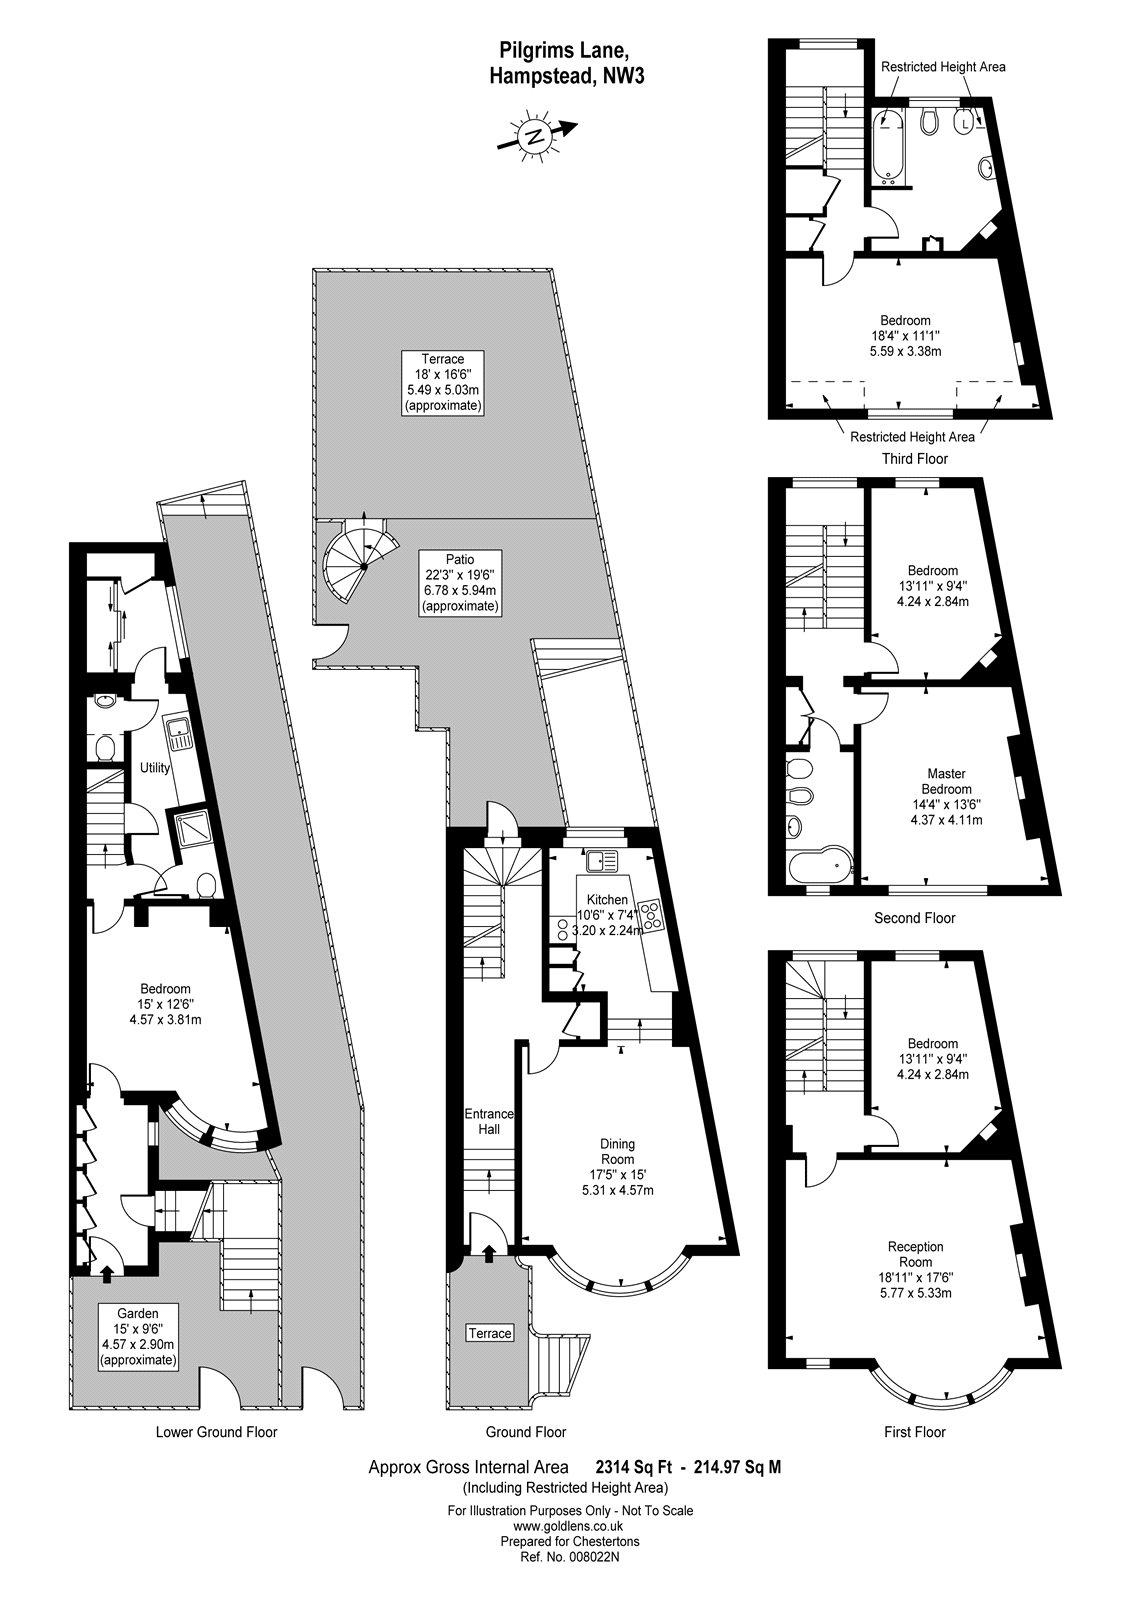 Pilgrims Lane Hampstead London Nw3 5 Bedroom Semi